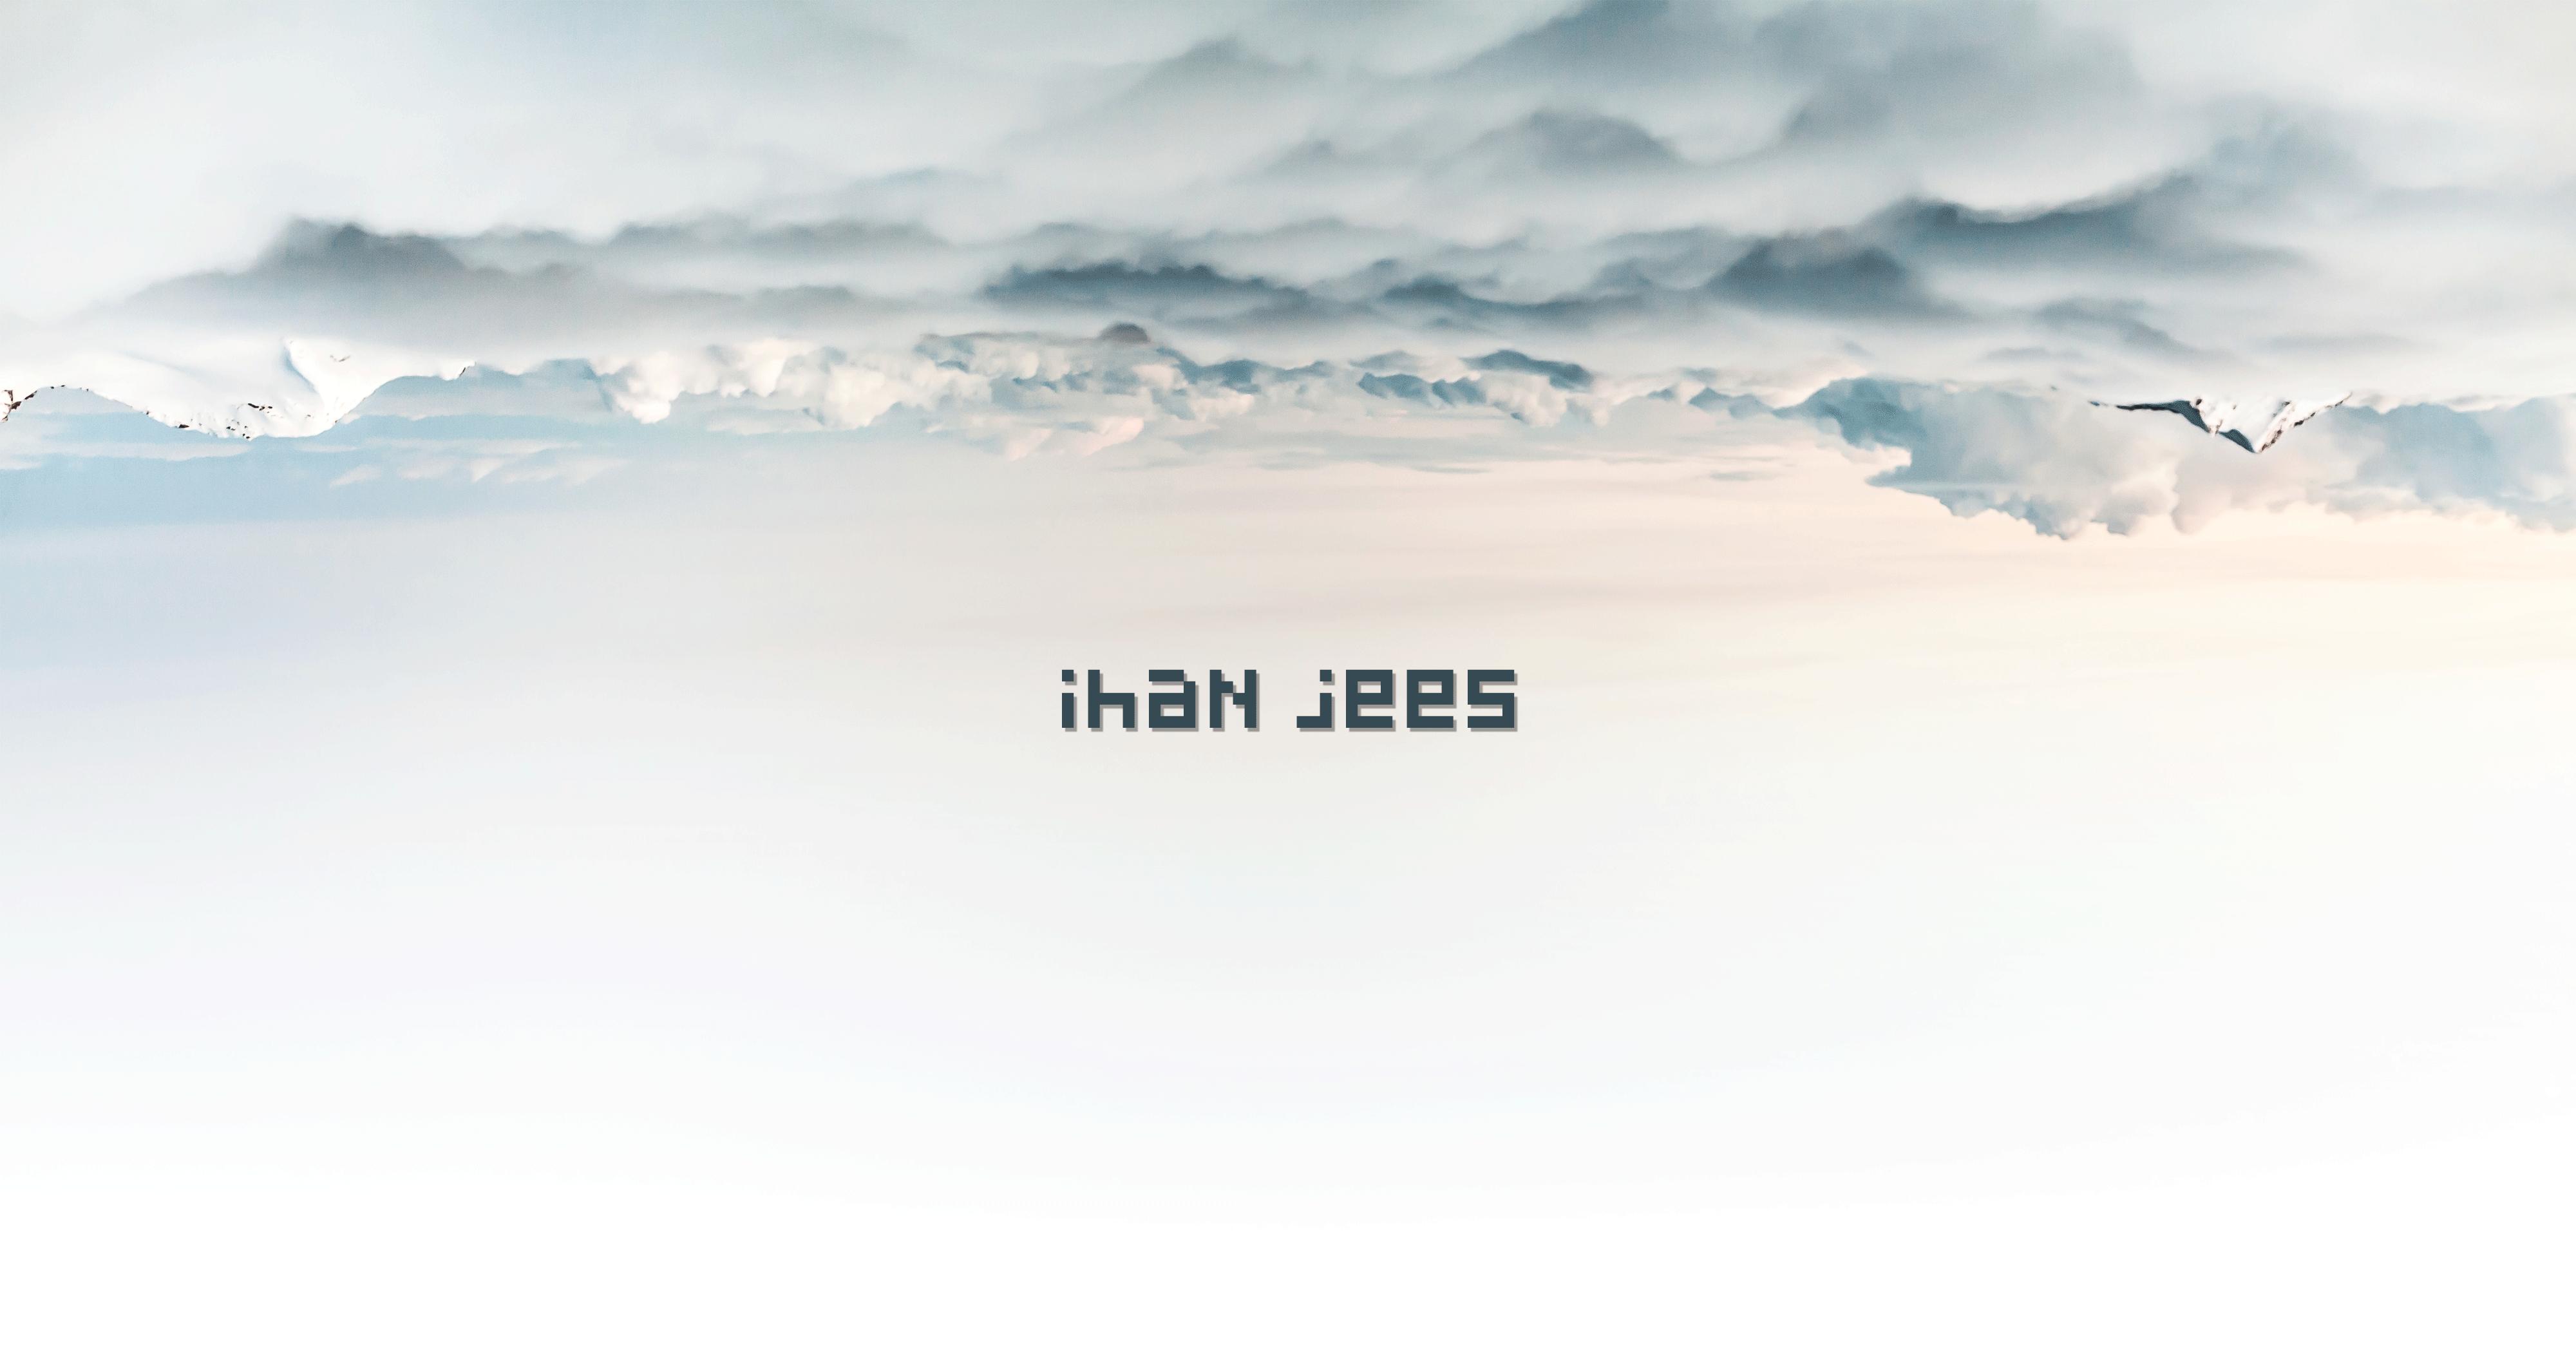 Ihan jees